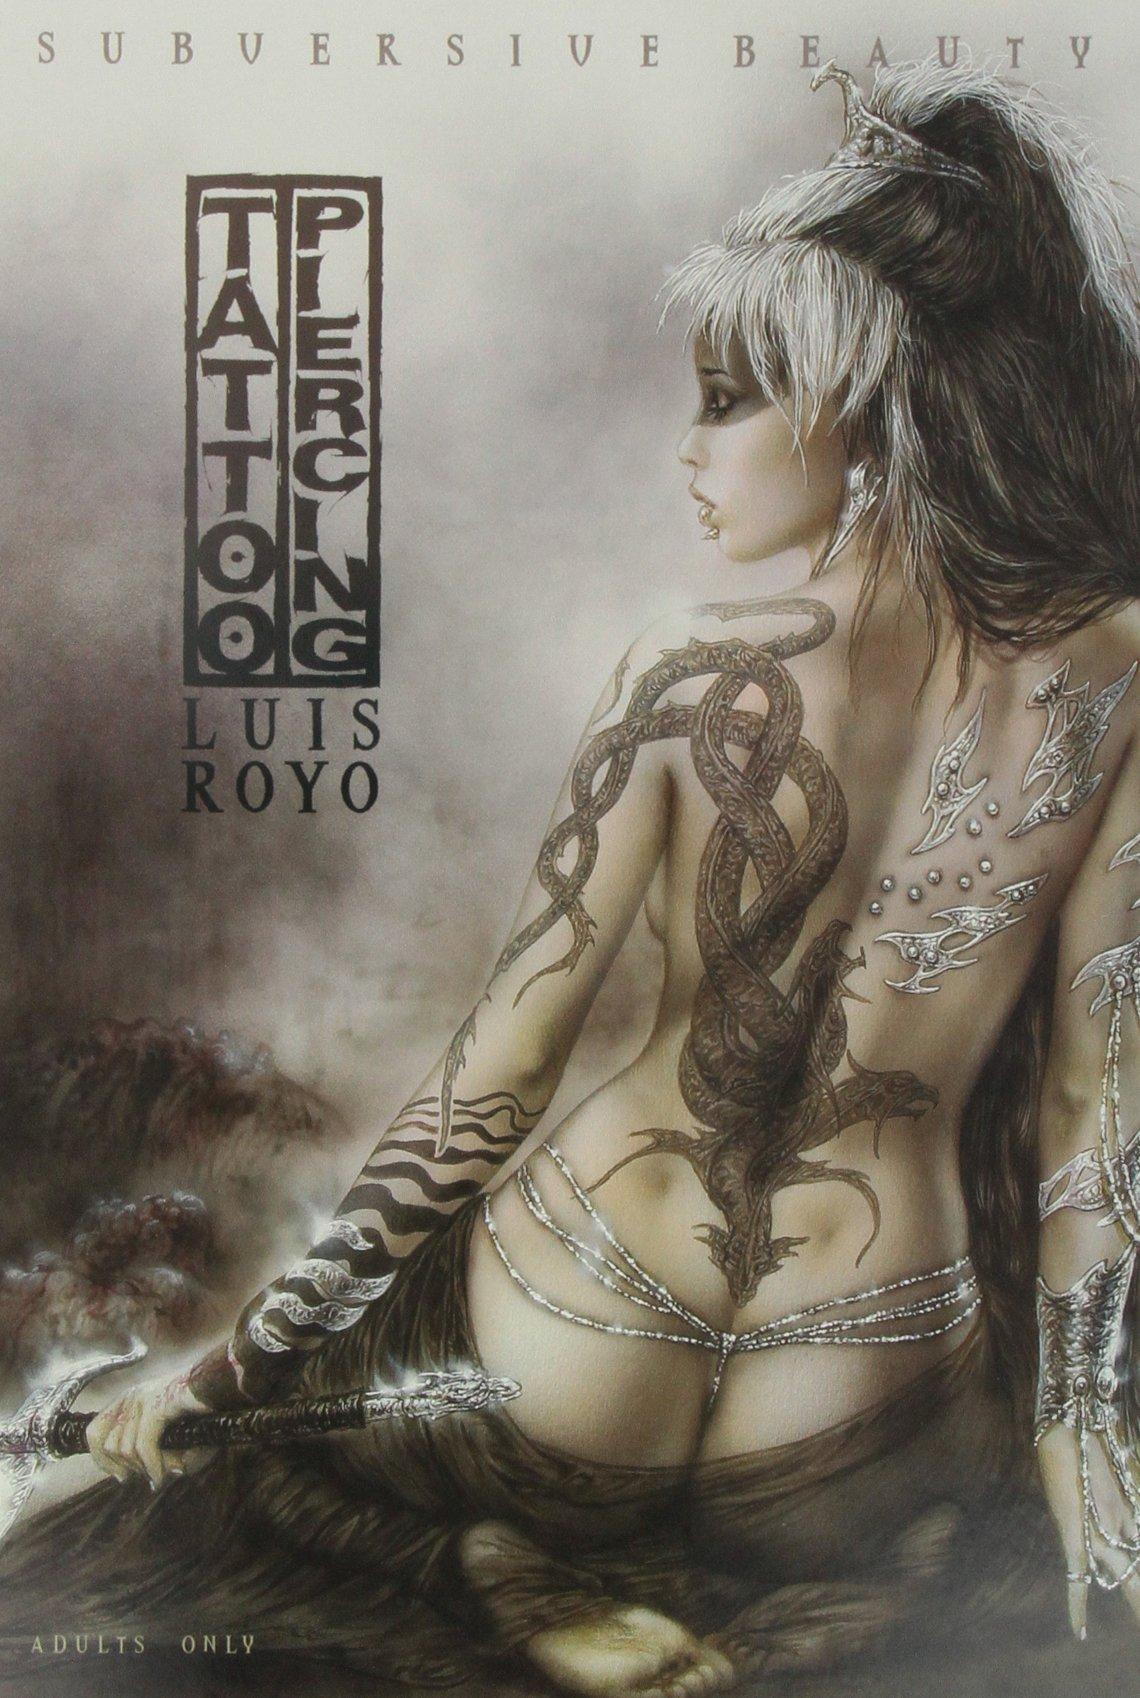 Portafolio Tattoo Piercing   Subversive Beauty